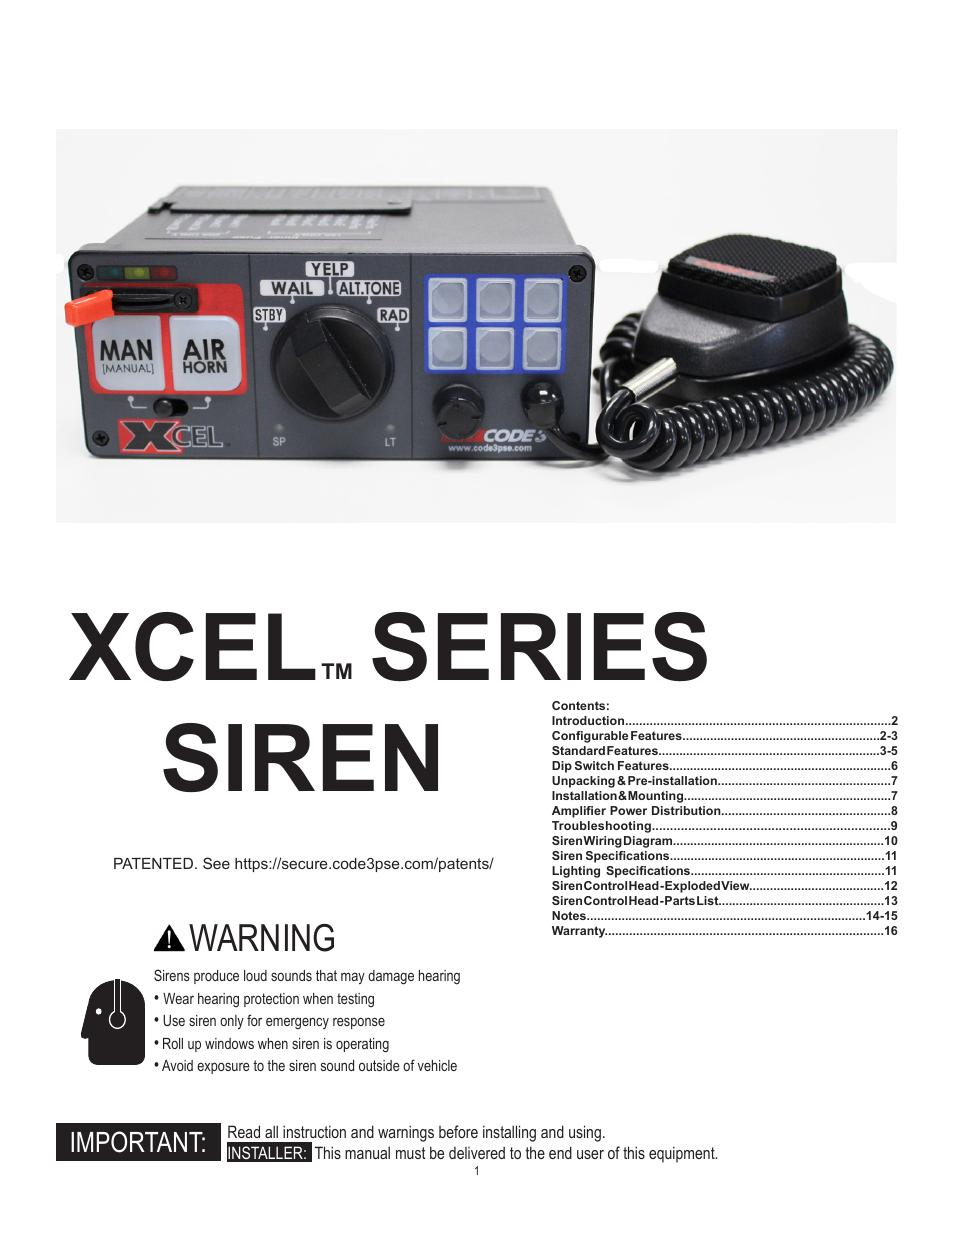 Code 3 Xcel Siren Wiring Diagram Manual Of User 12 Pages Rh Manualsdir Com